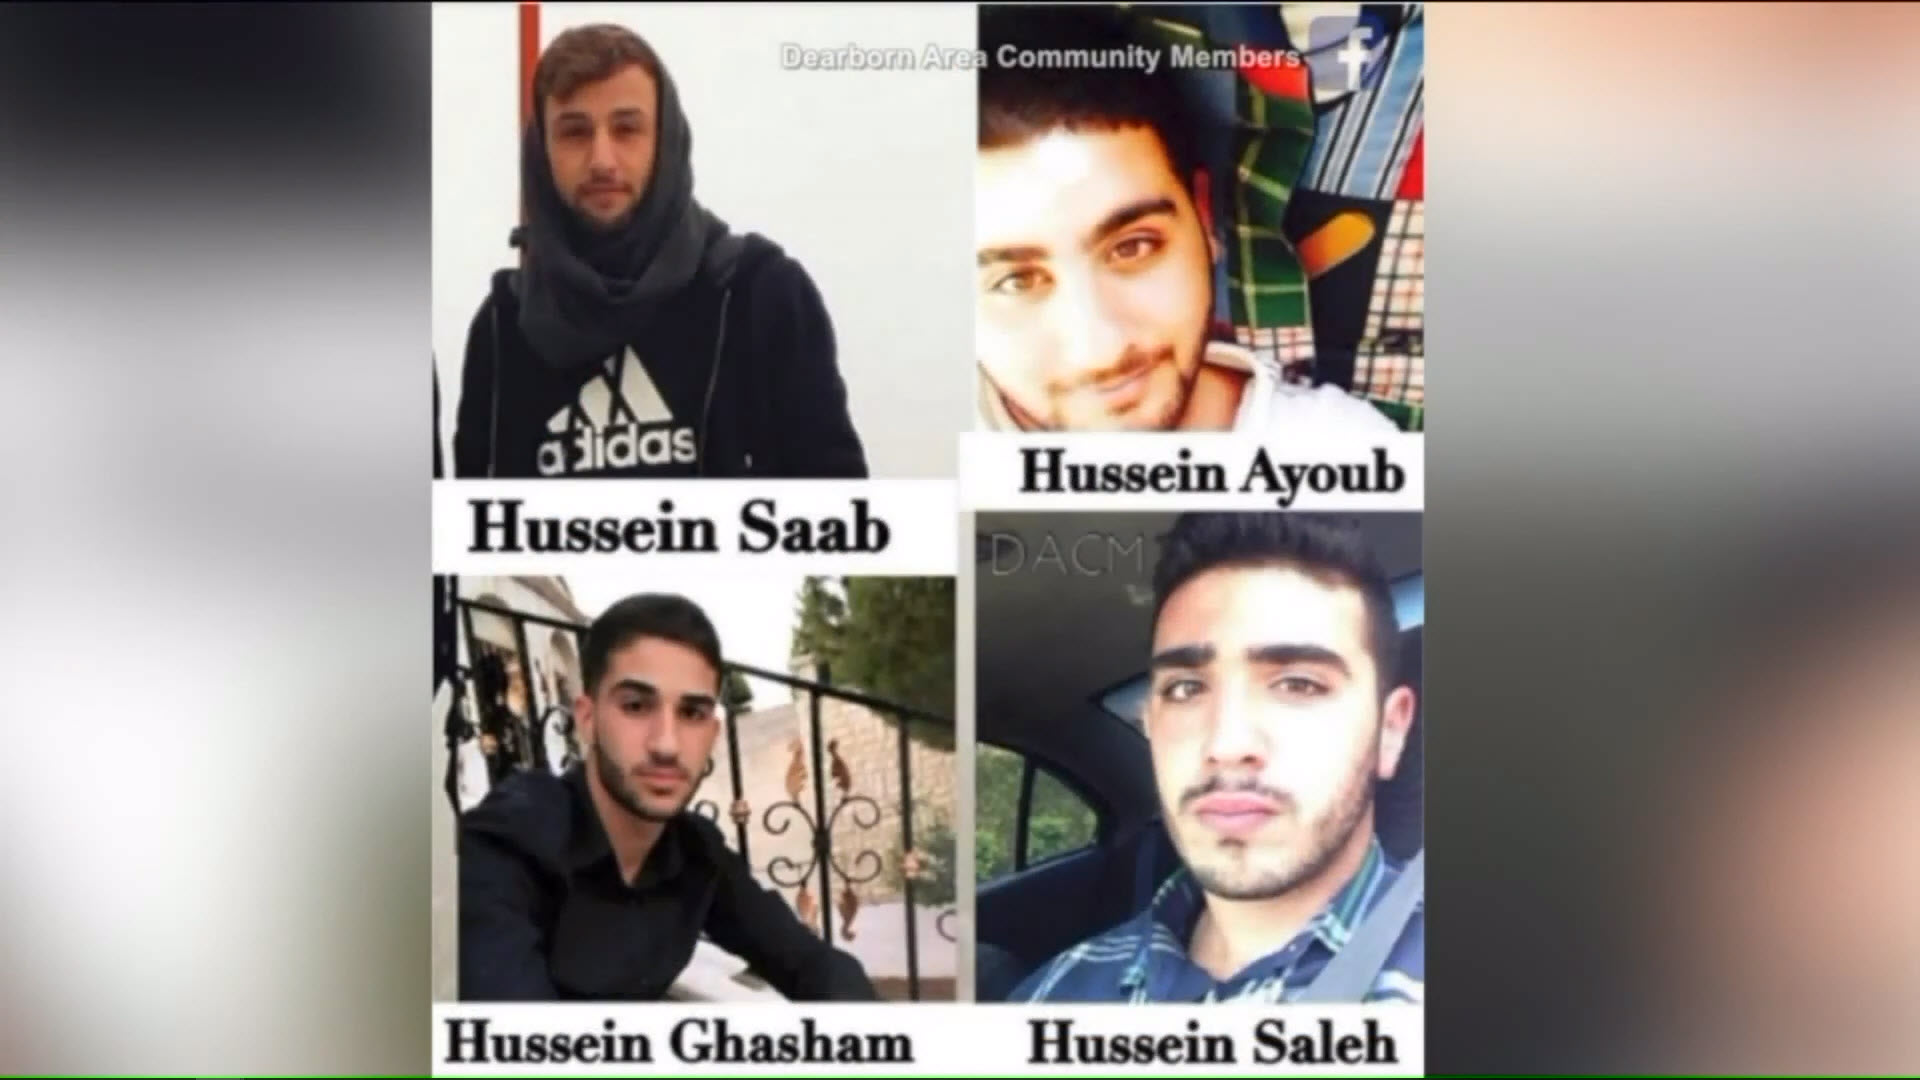 Hussein Saab, Hussein Ayoub, Hussein Ghasham and Hussein Saleh